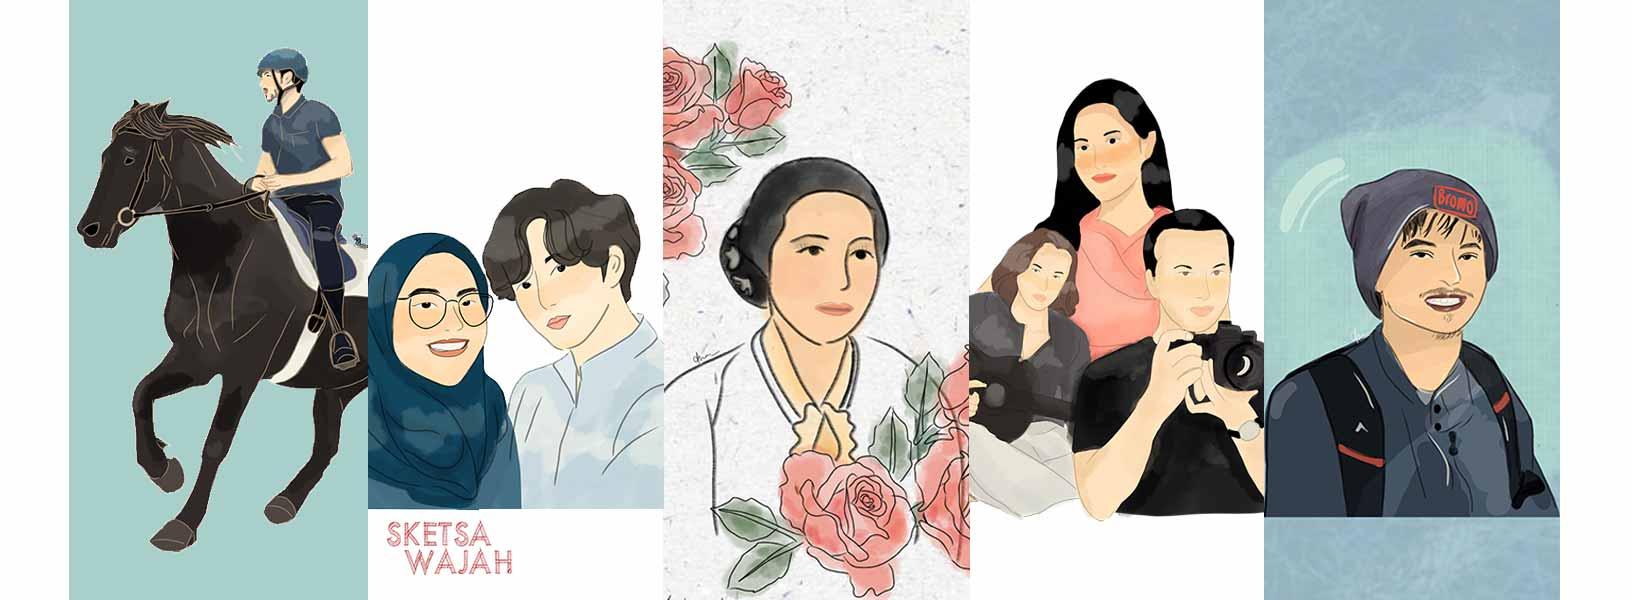 Karya Anisa Nur Anggraini sketcher Sketsa Wajah